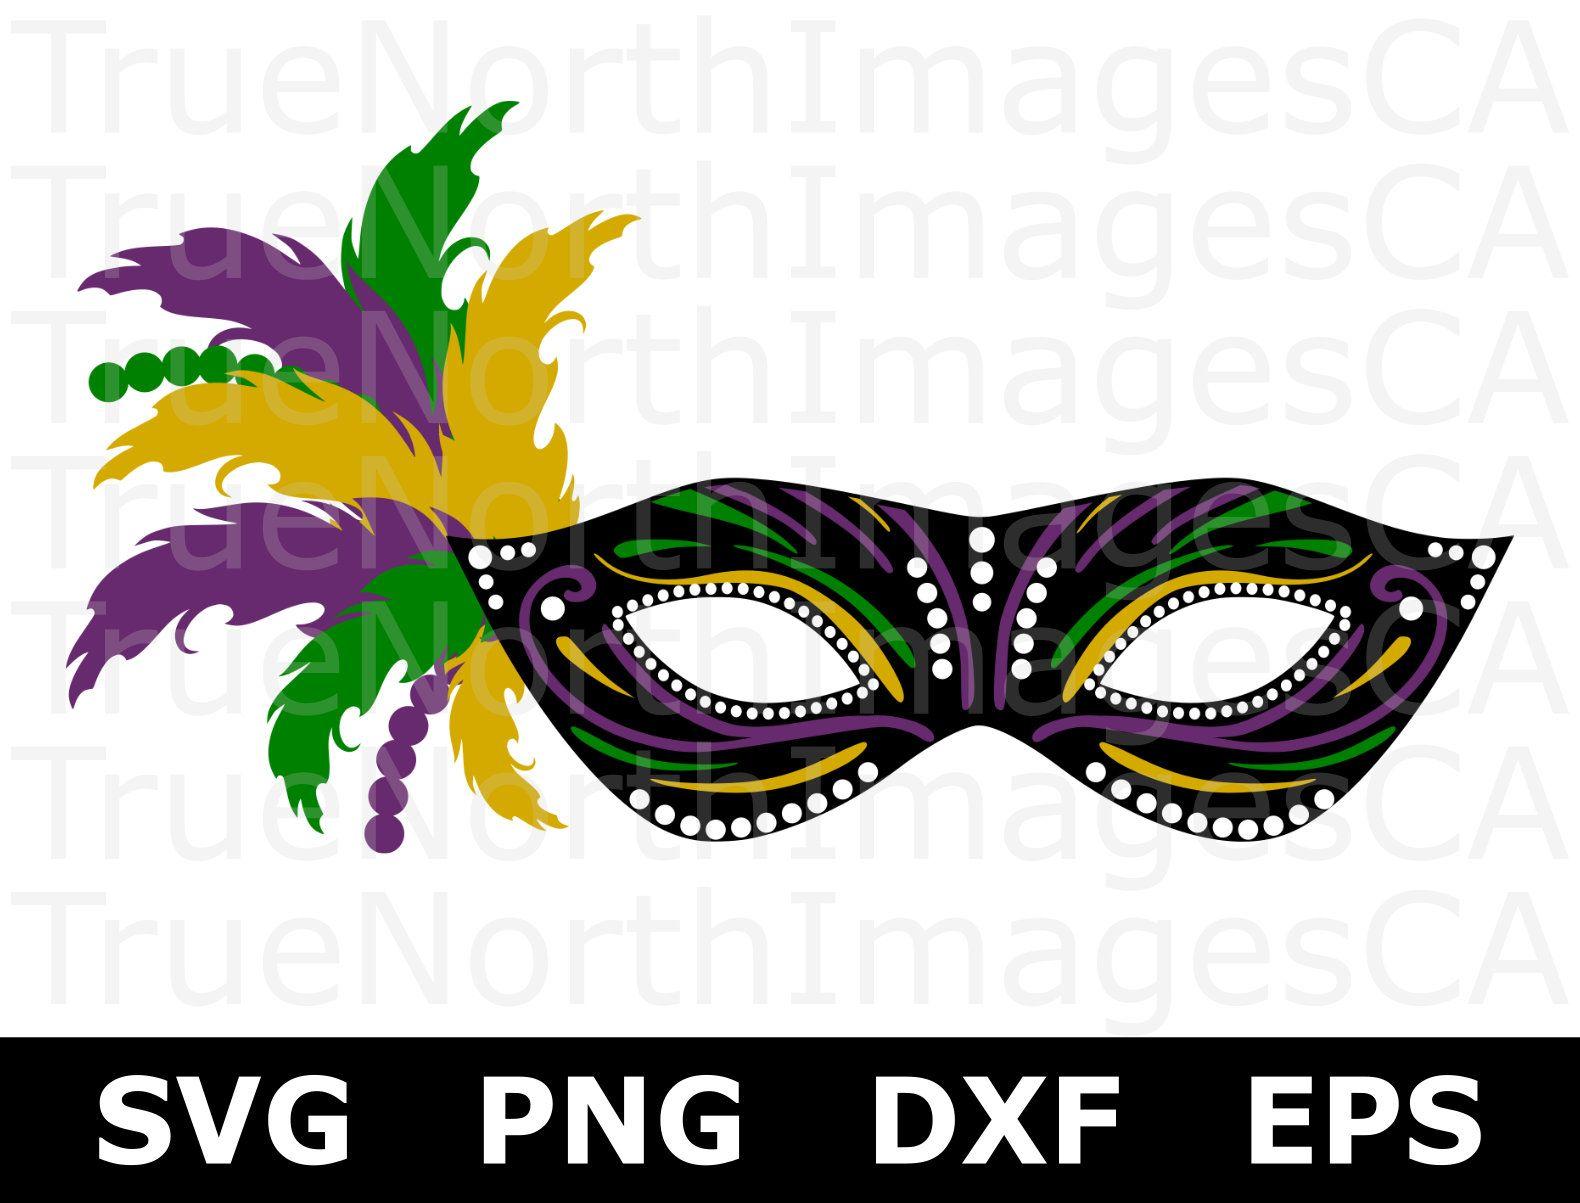 Mardi Gras SVG / Mardi Gras Mask SVG / Mardi Gras Shirt